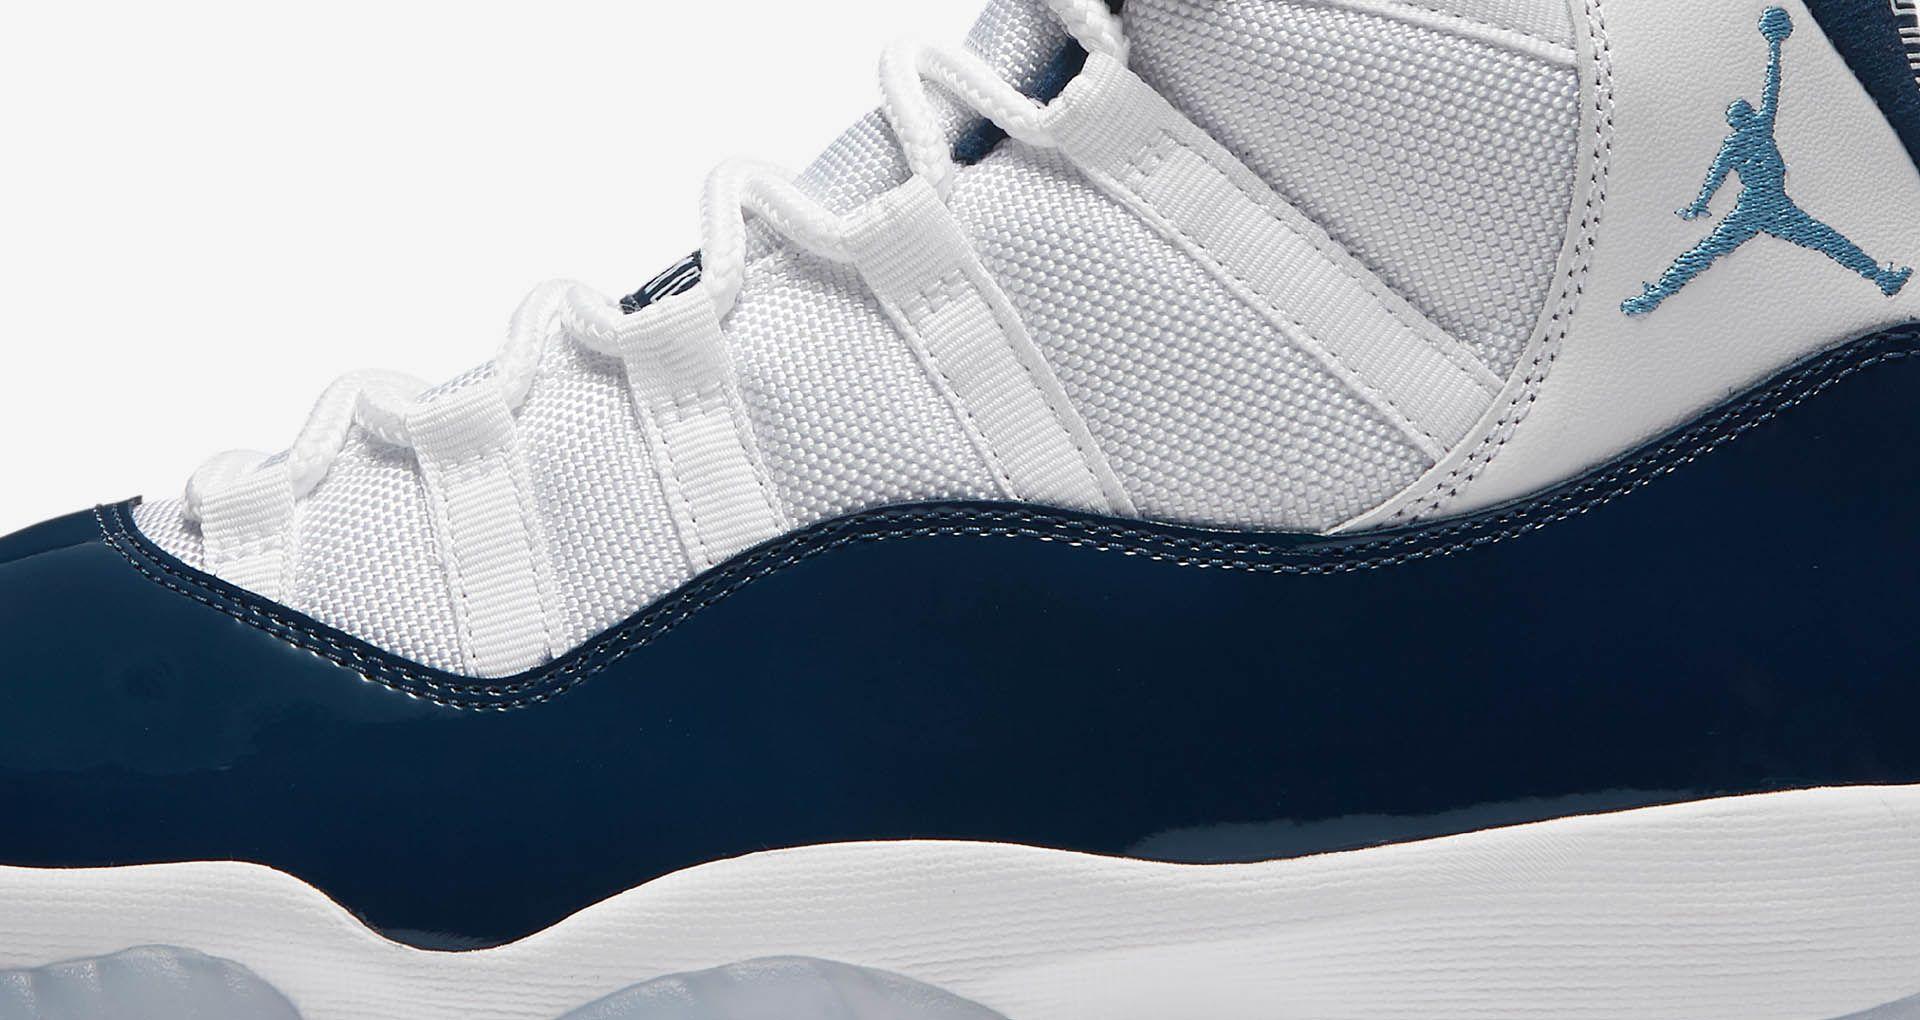 73234b67a8a6 Air Jordan 11 Retro  Midnight Navy  Release Date. Nike+ SNKRS